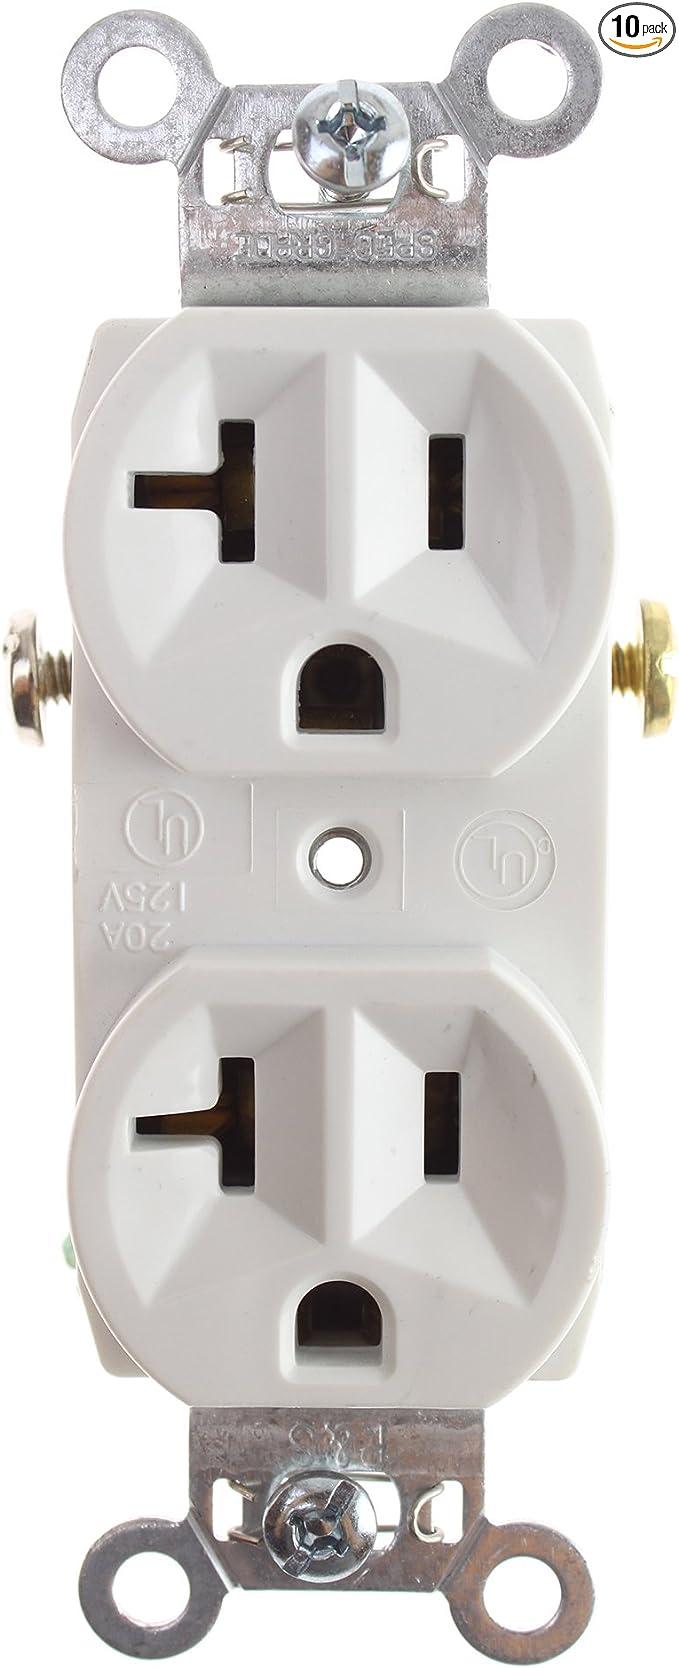 P /& S CR20-W Commercial Spec Grade Duplex Receptacle 20A 125V 5-20R White